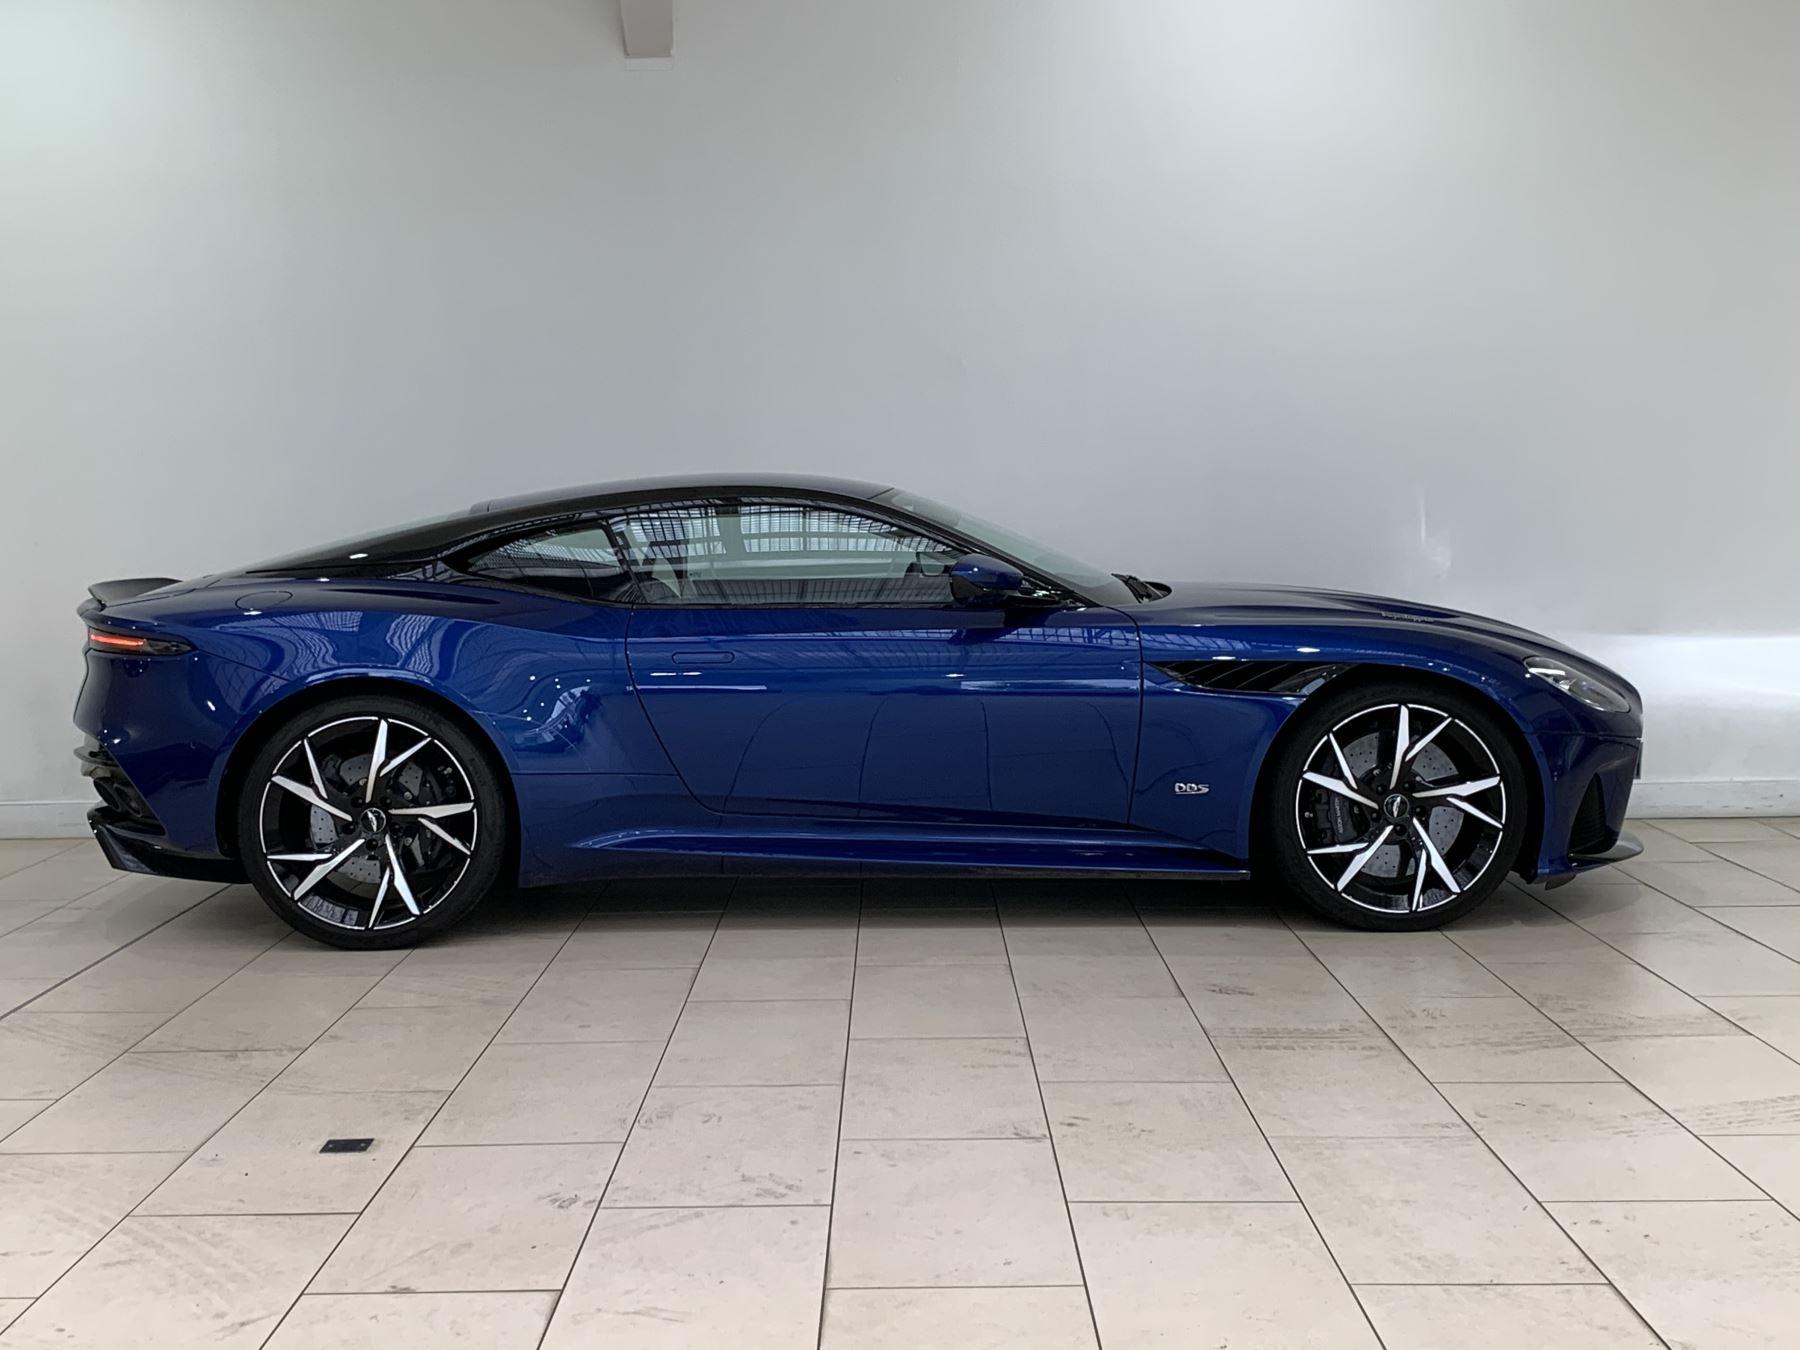 Aston Martin DBS V12 Superleggera 2dr Touchtronic image 2